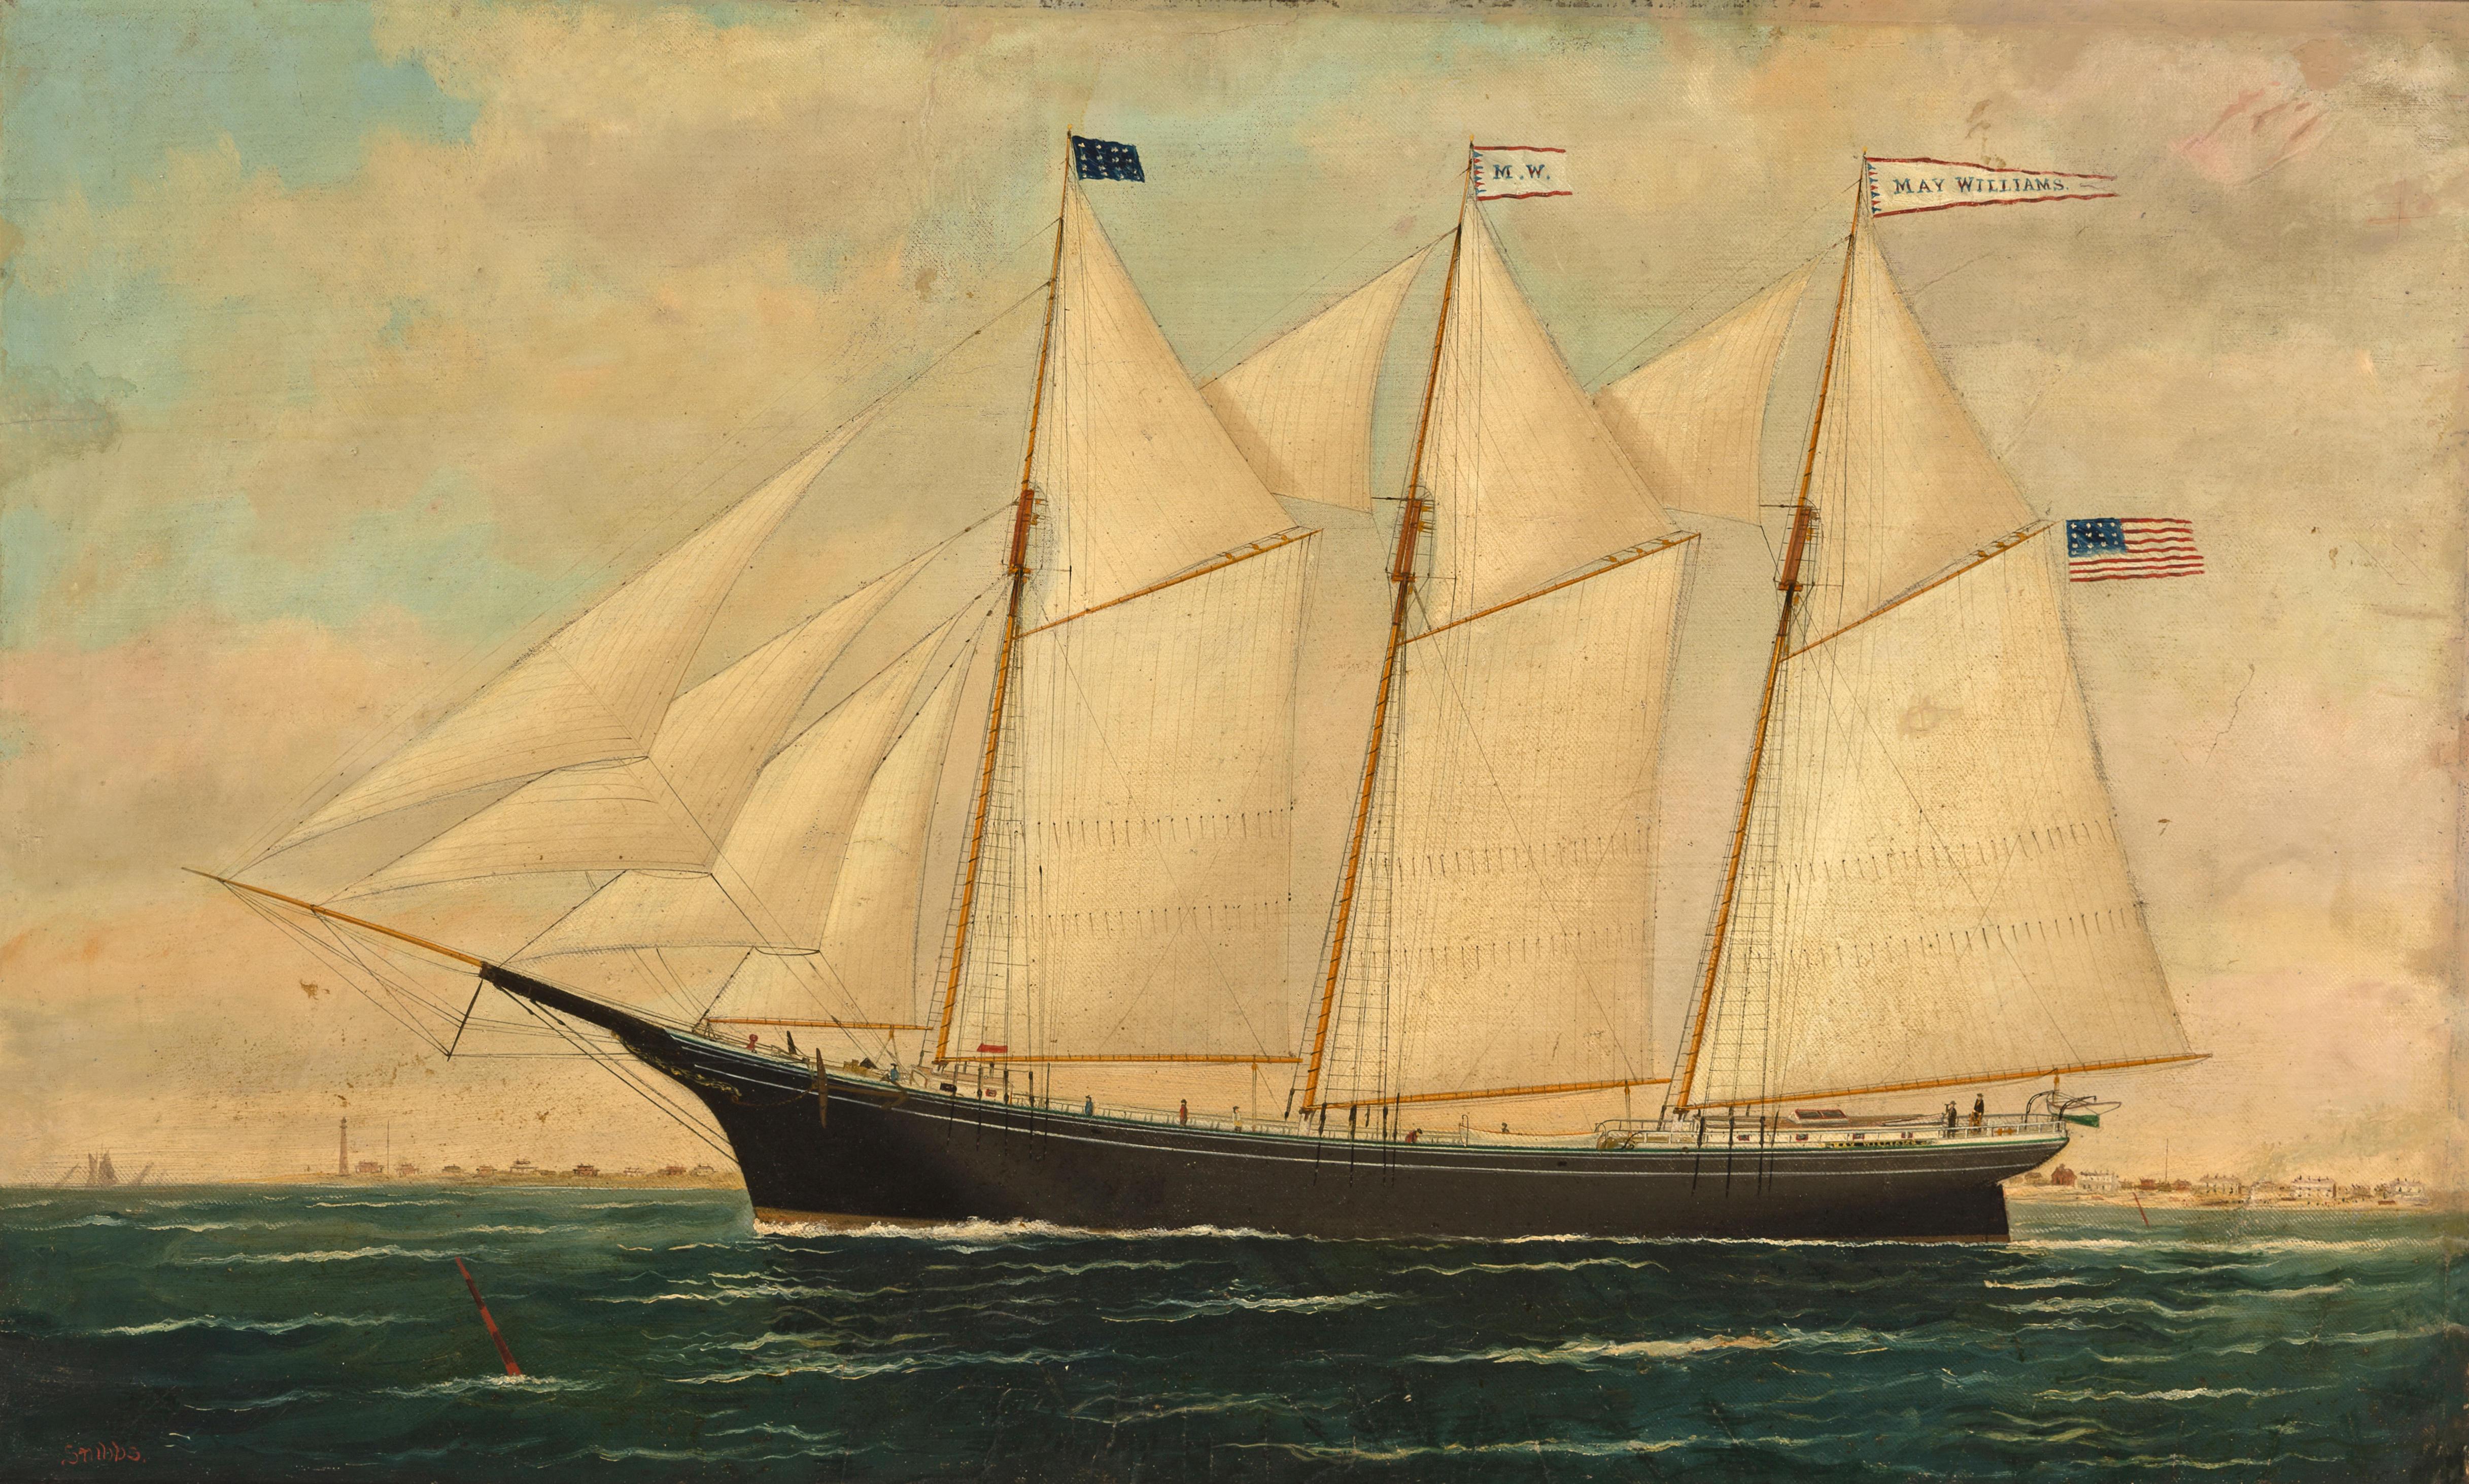 Lumberman three masted schooner